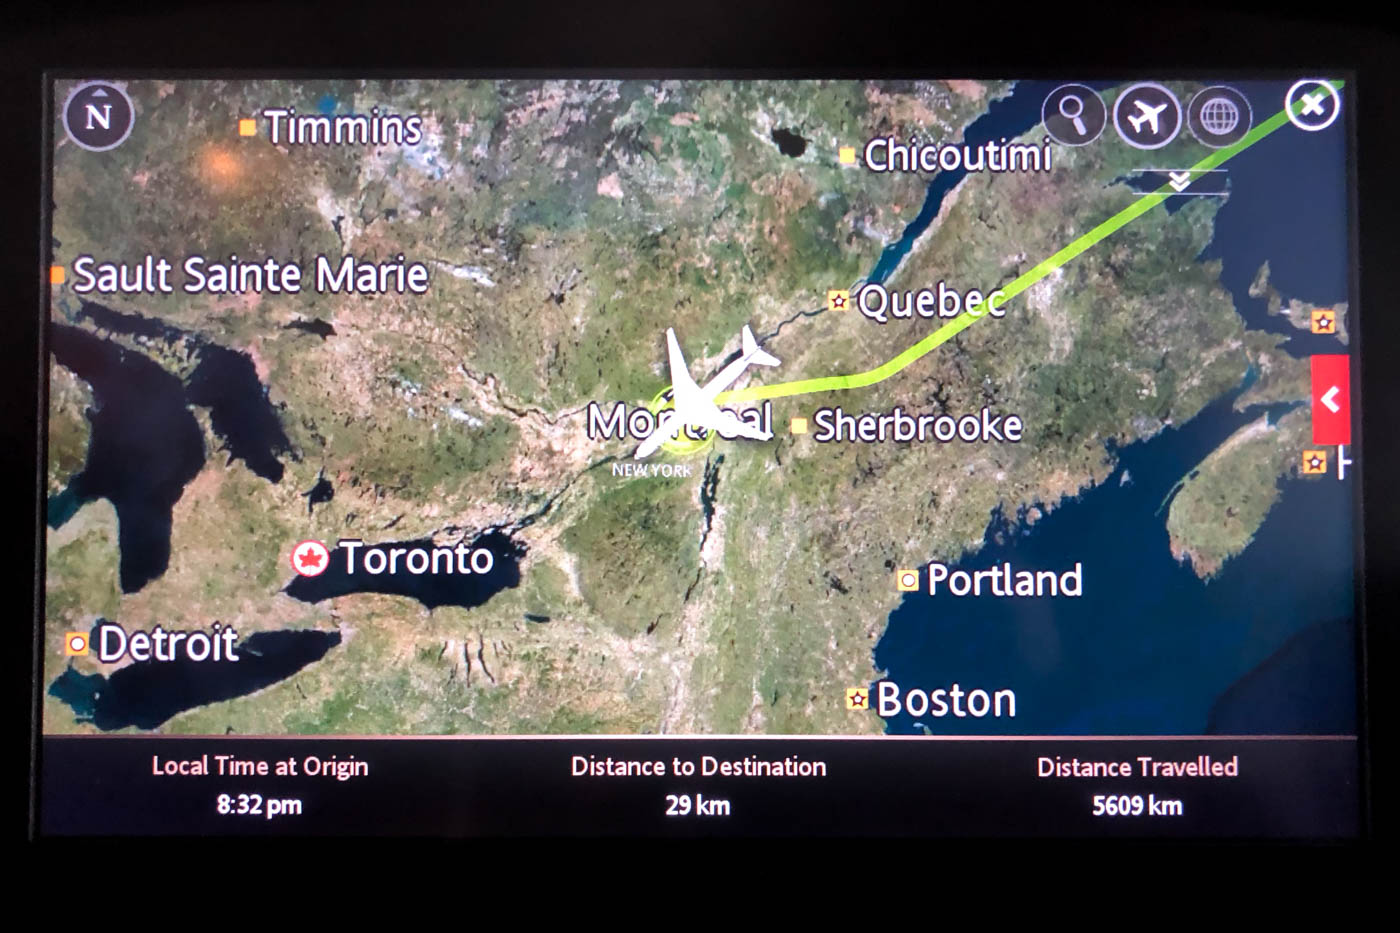 Landing in Montreal